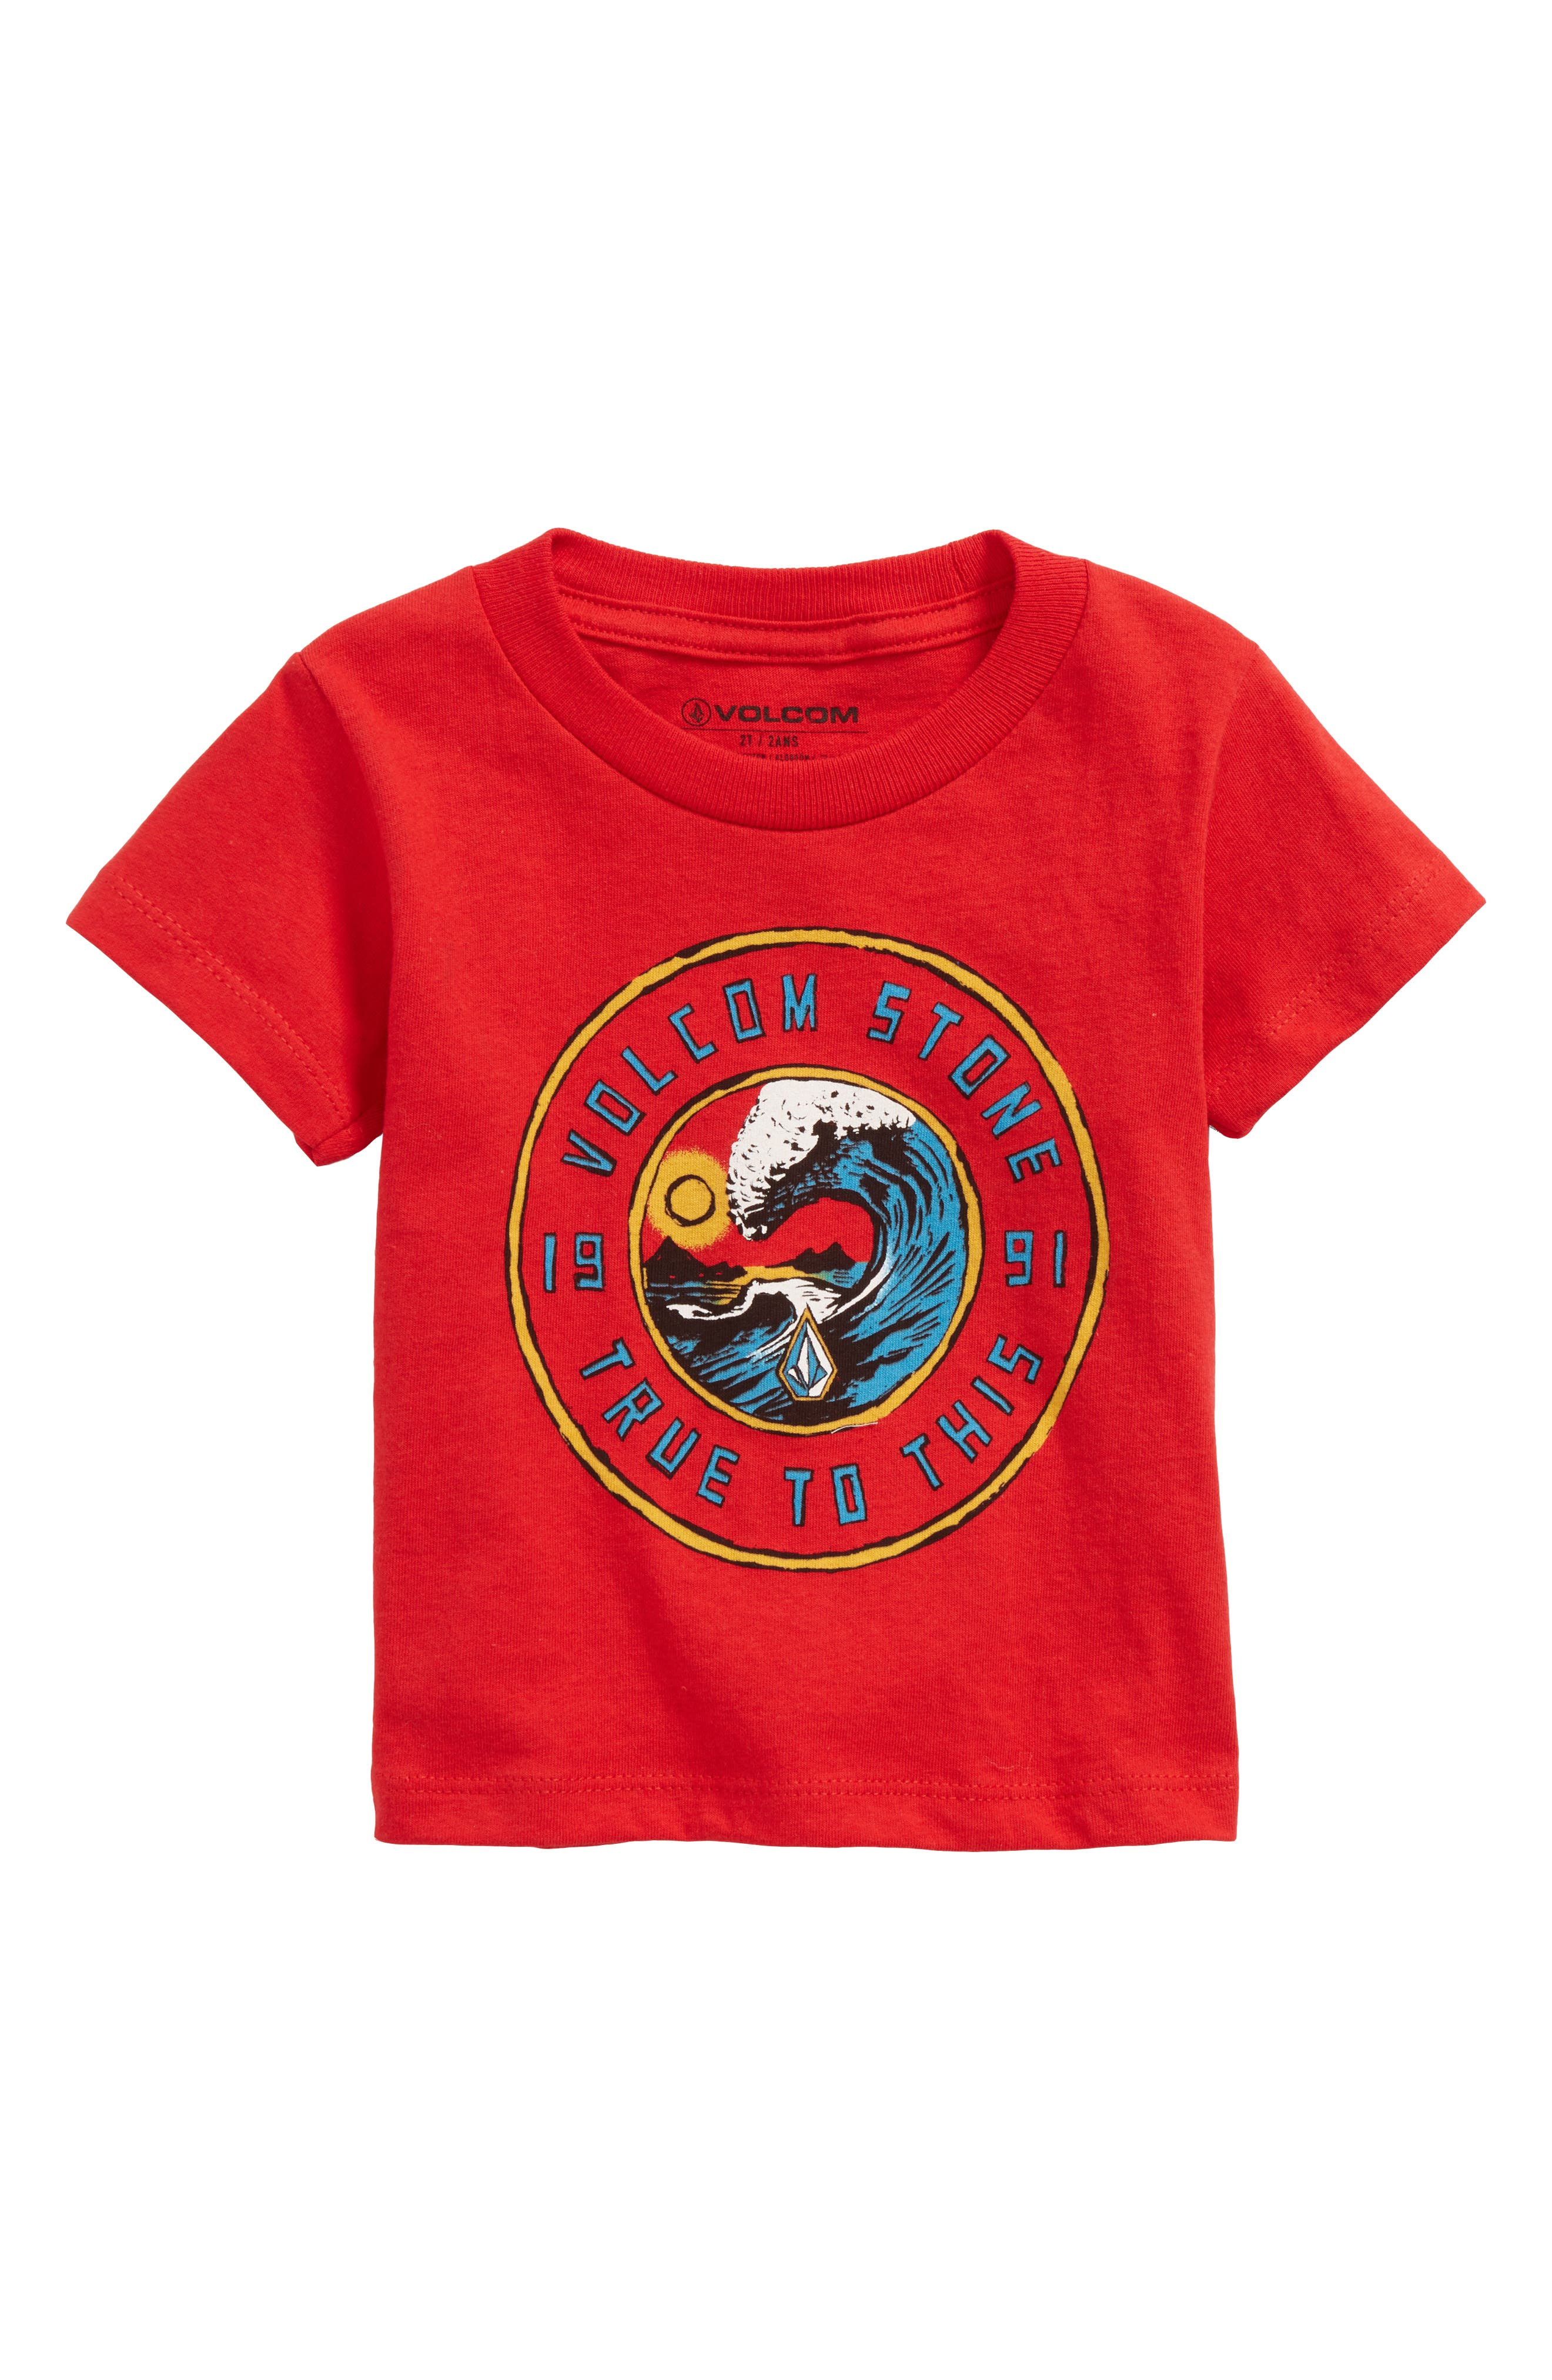 Alternate Image 1 Selected - Volcom Furnish T-Shirt (Toddler Boys & Little Boys)